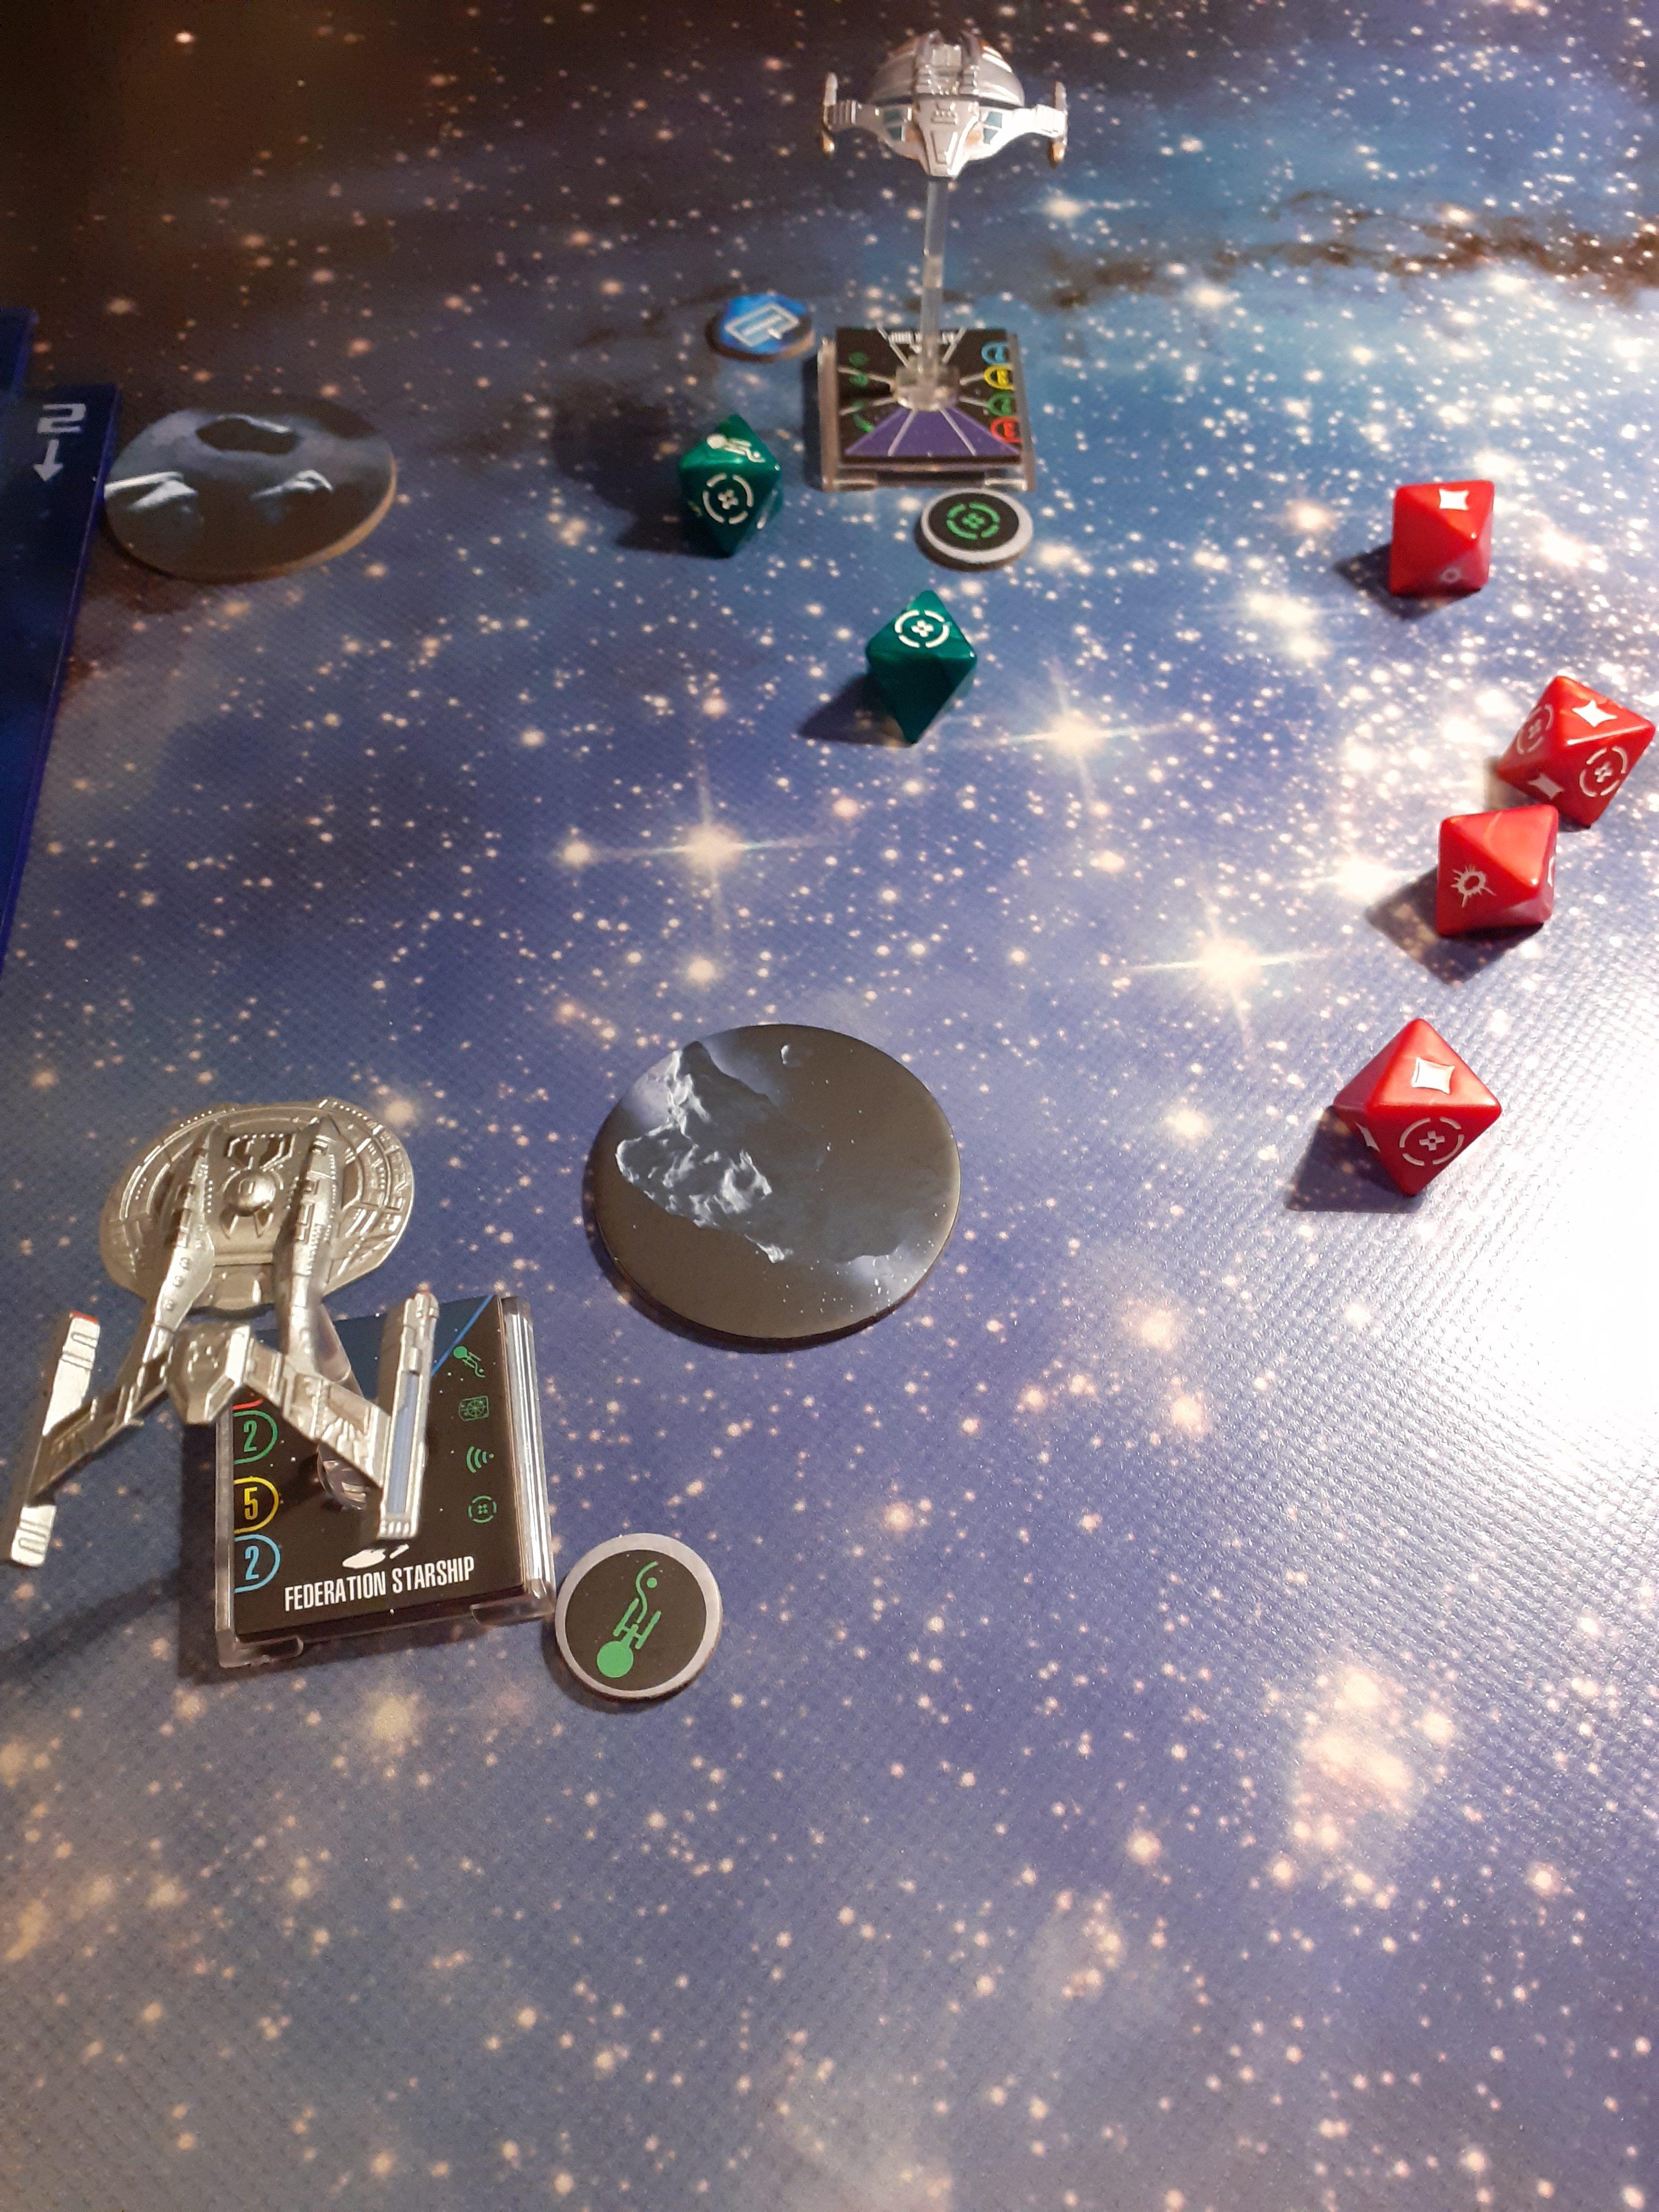 [Star Trek Alliance - Dominion War Campaign I] Computerlogbuch der Solo-Kampagne von Commander Cut  20210222_010925-e1614034032938